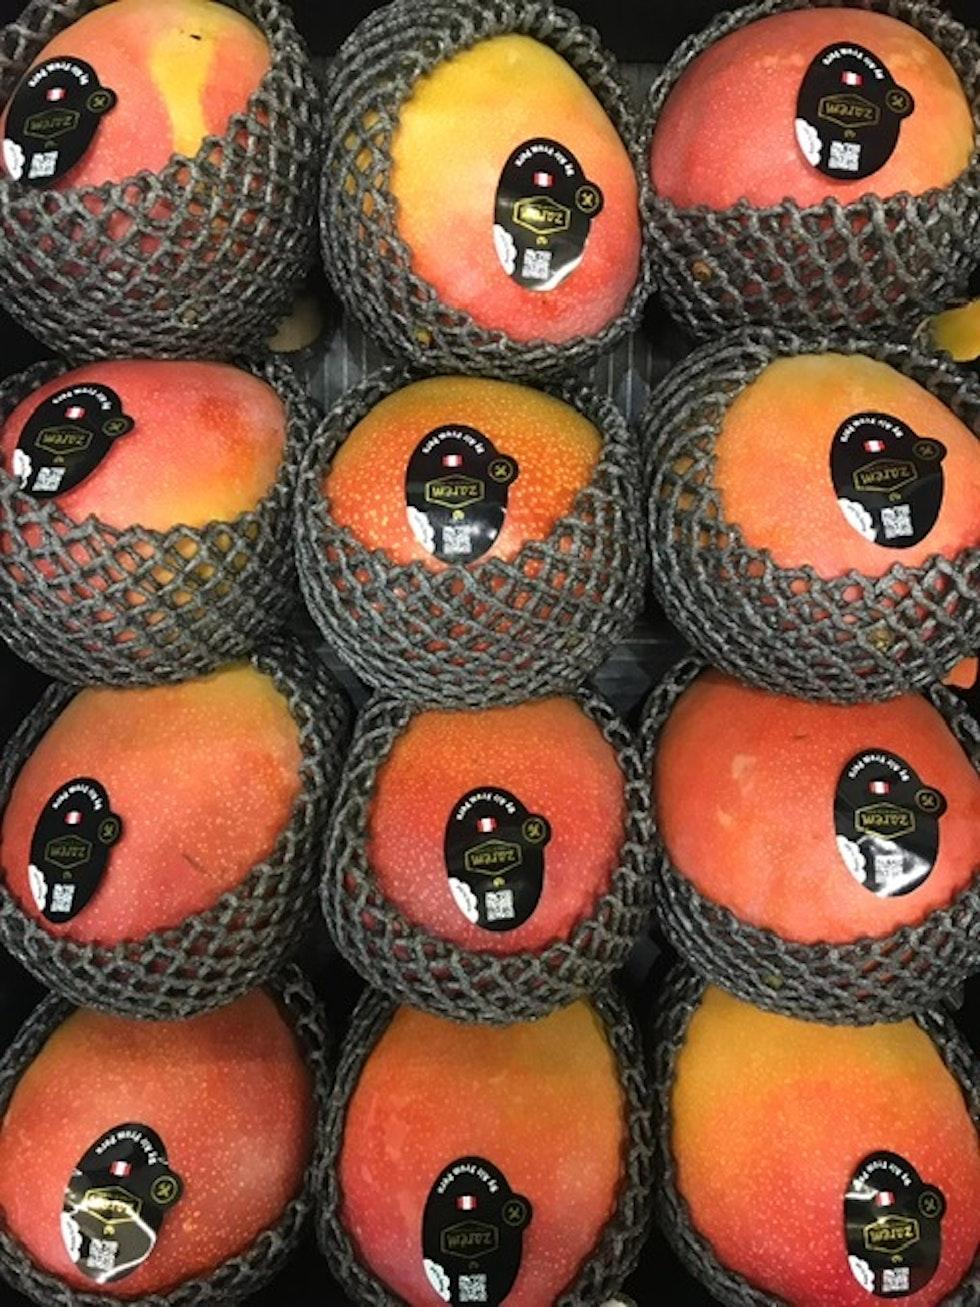 Franco Frutas Ltd